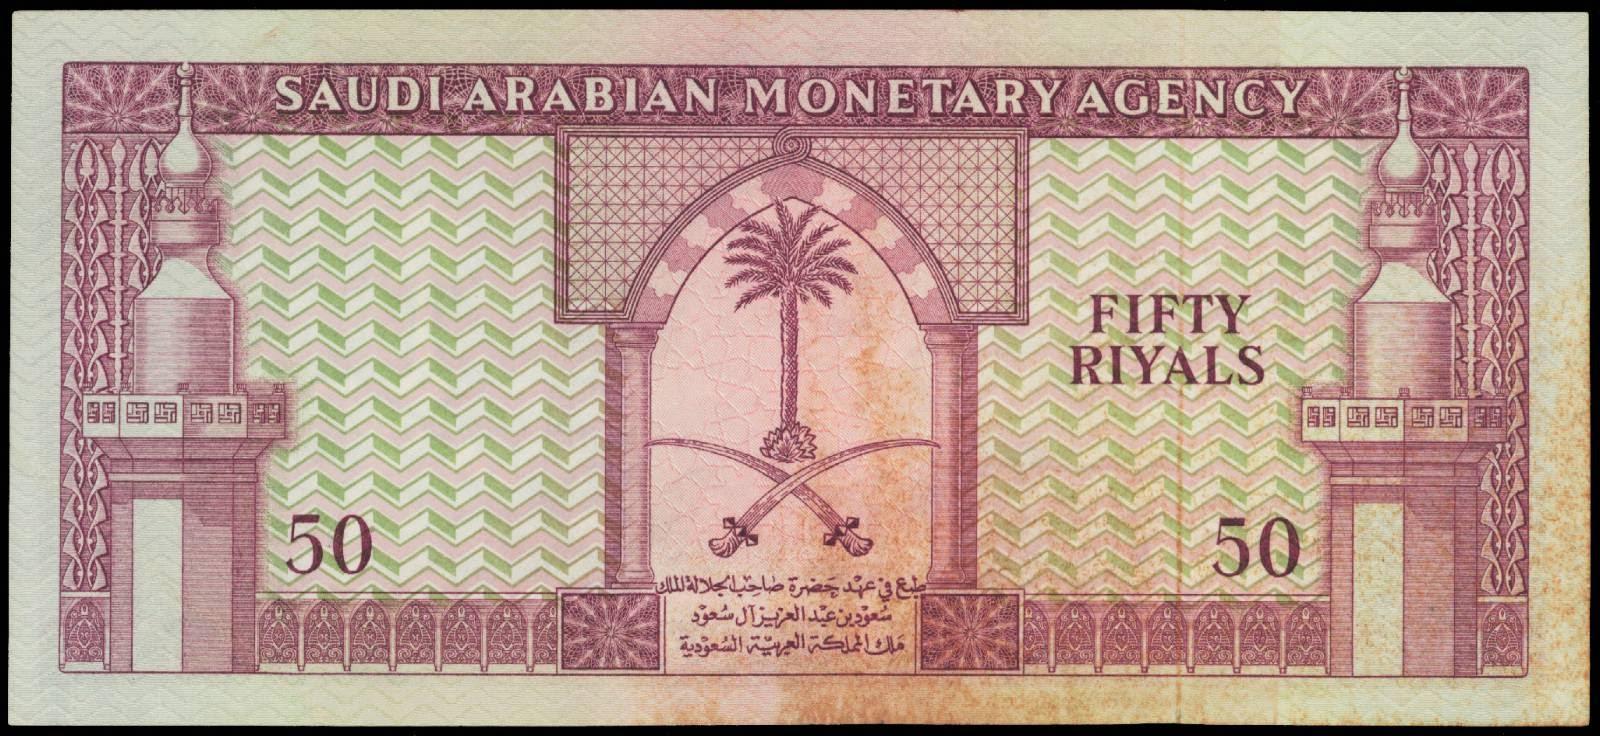 Saudi Arabia money currency  50 Riyals banknote 1961